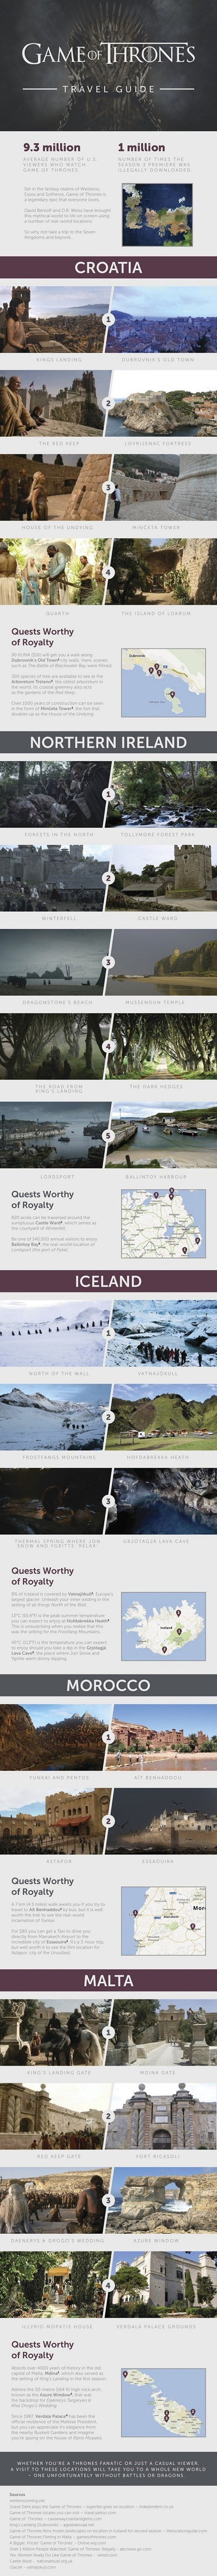 Iceland Croatia guide Malta morocco Game of Thrones Travel northern ireland - 7855889408